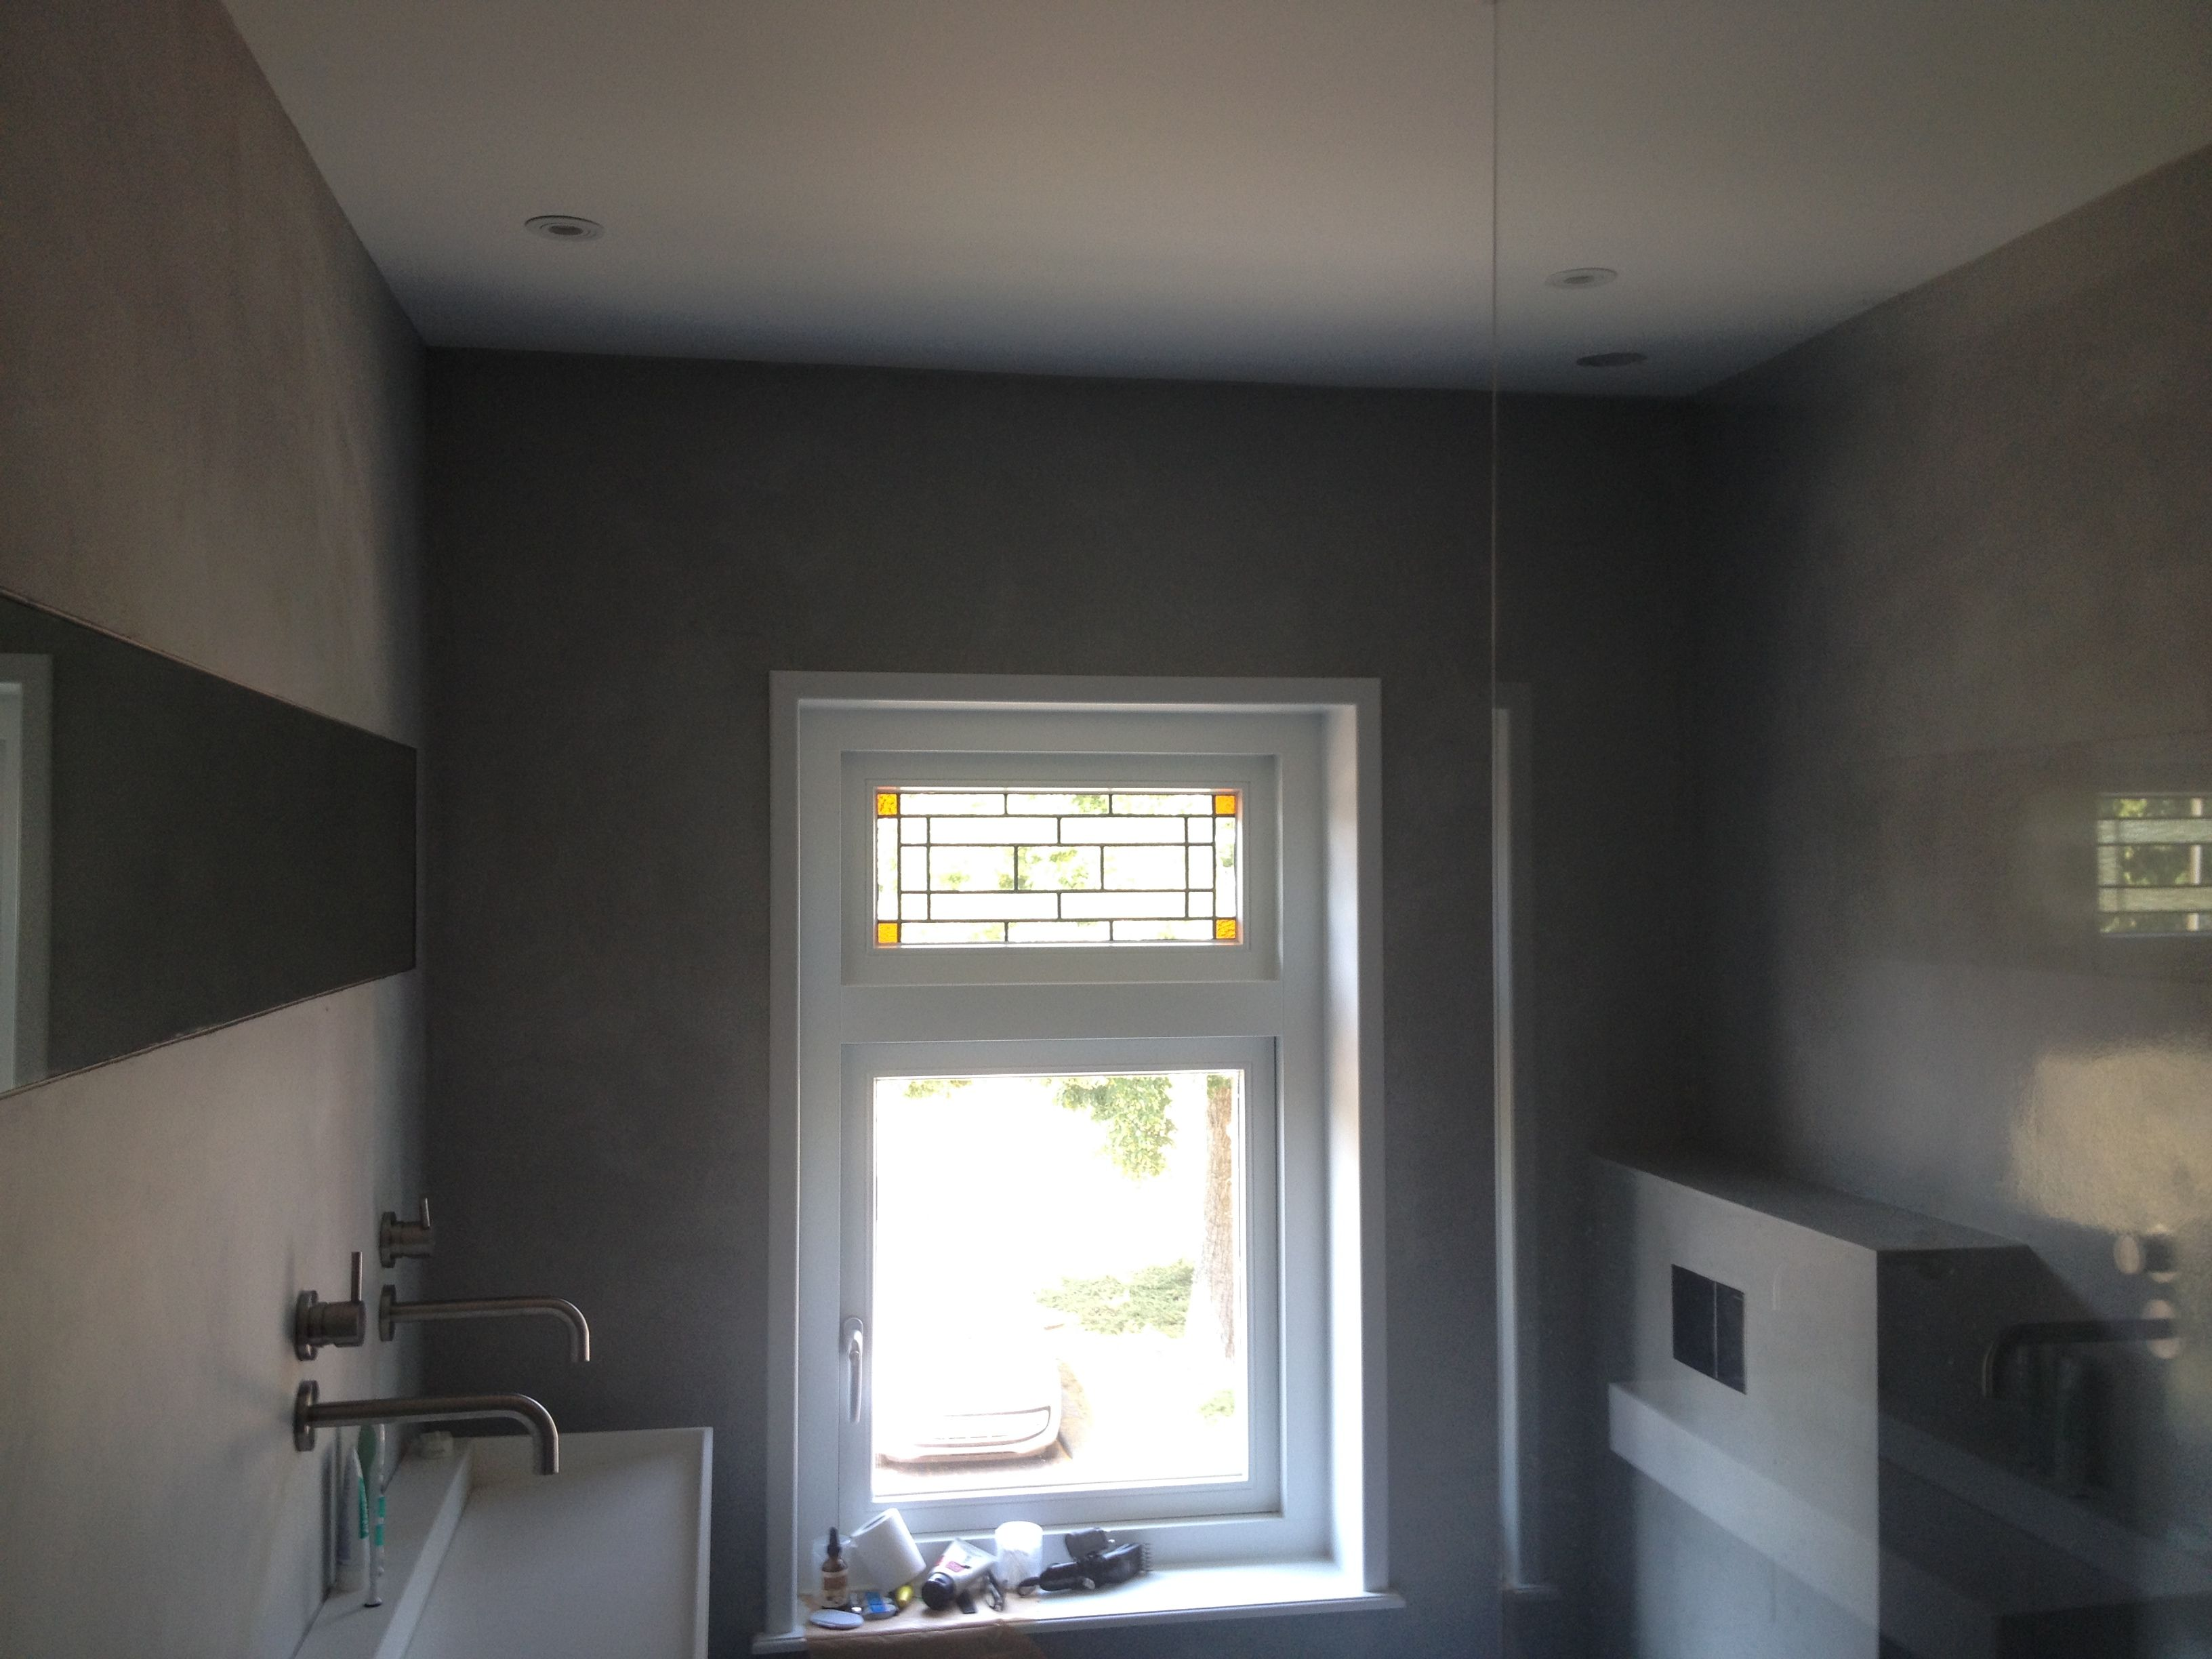 beton cire badkamer beton cirà pinterest